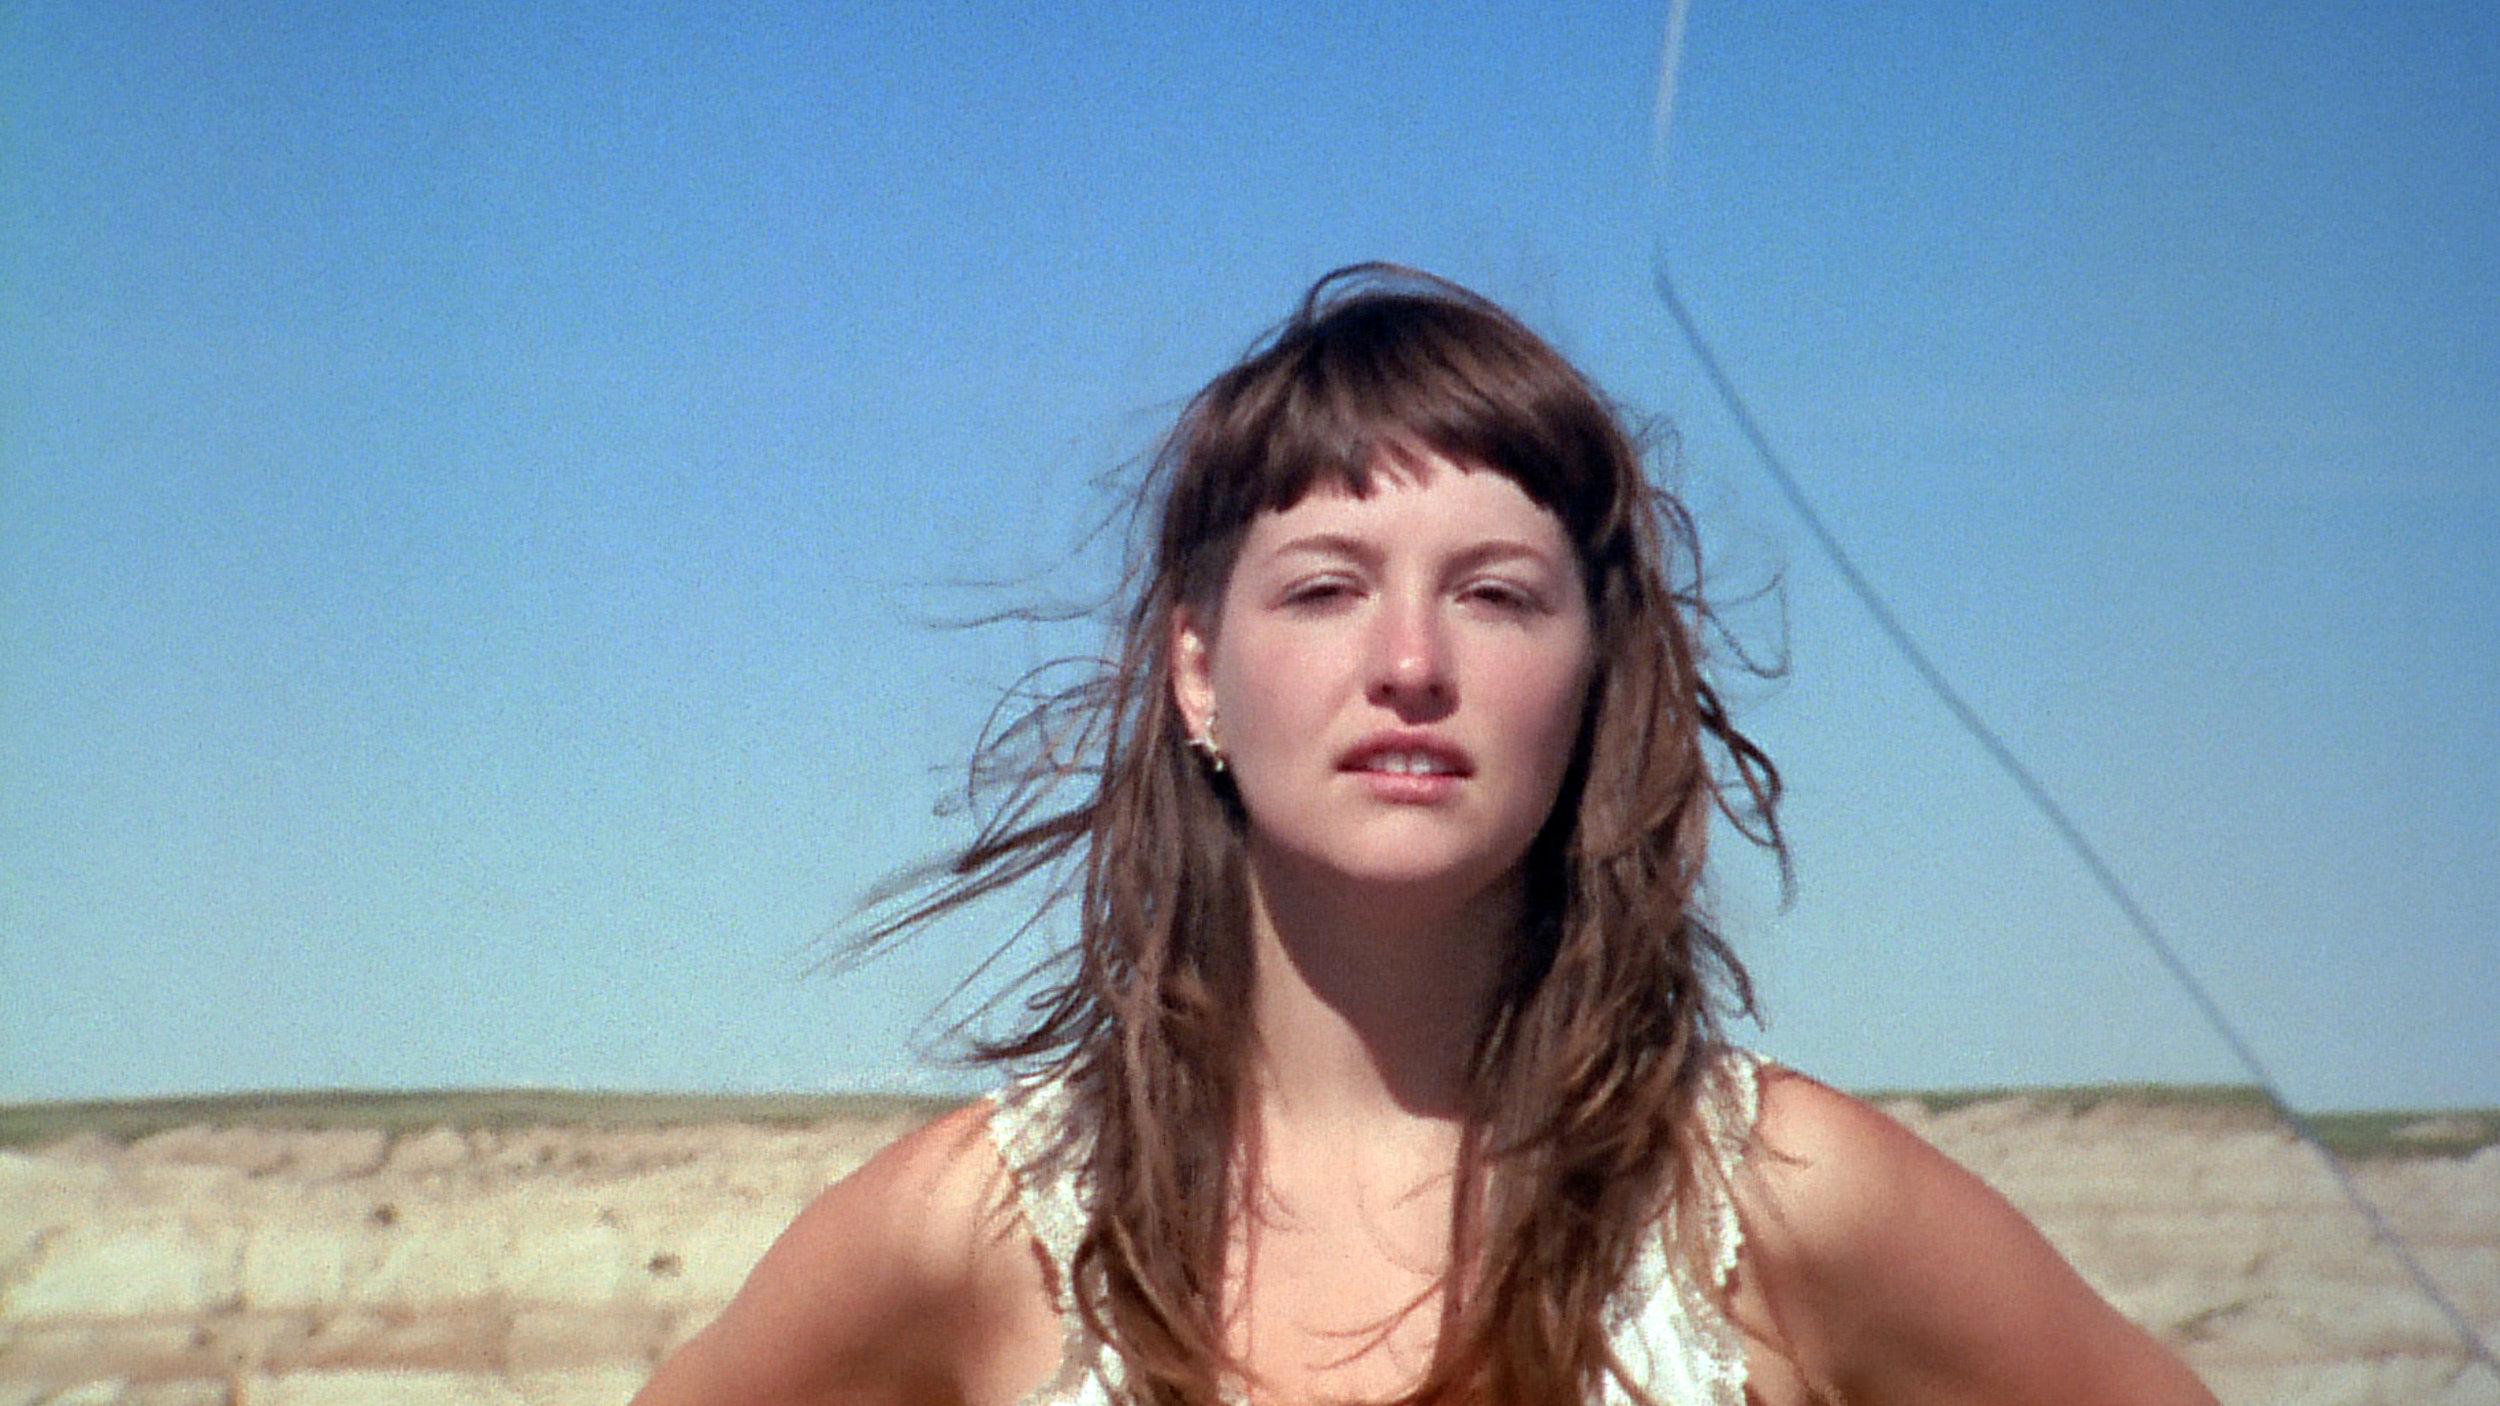 """No.7 Badlands"", image courtesy of FAR OUT FILM FEST"